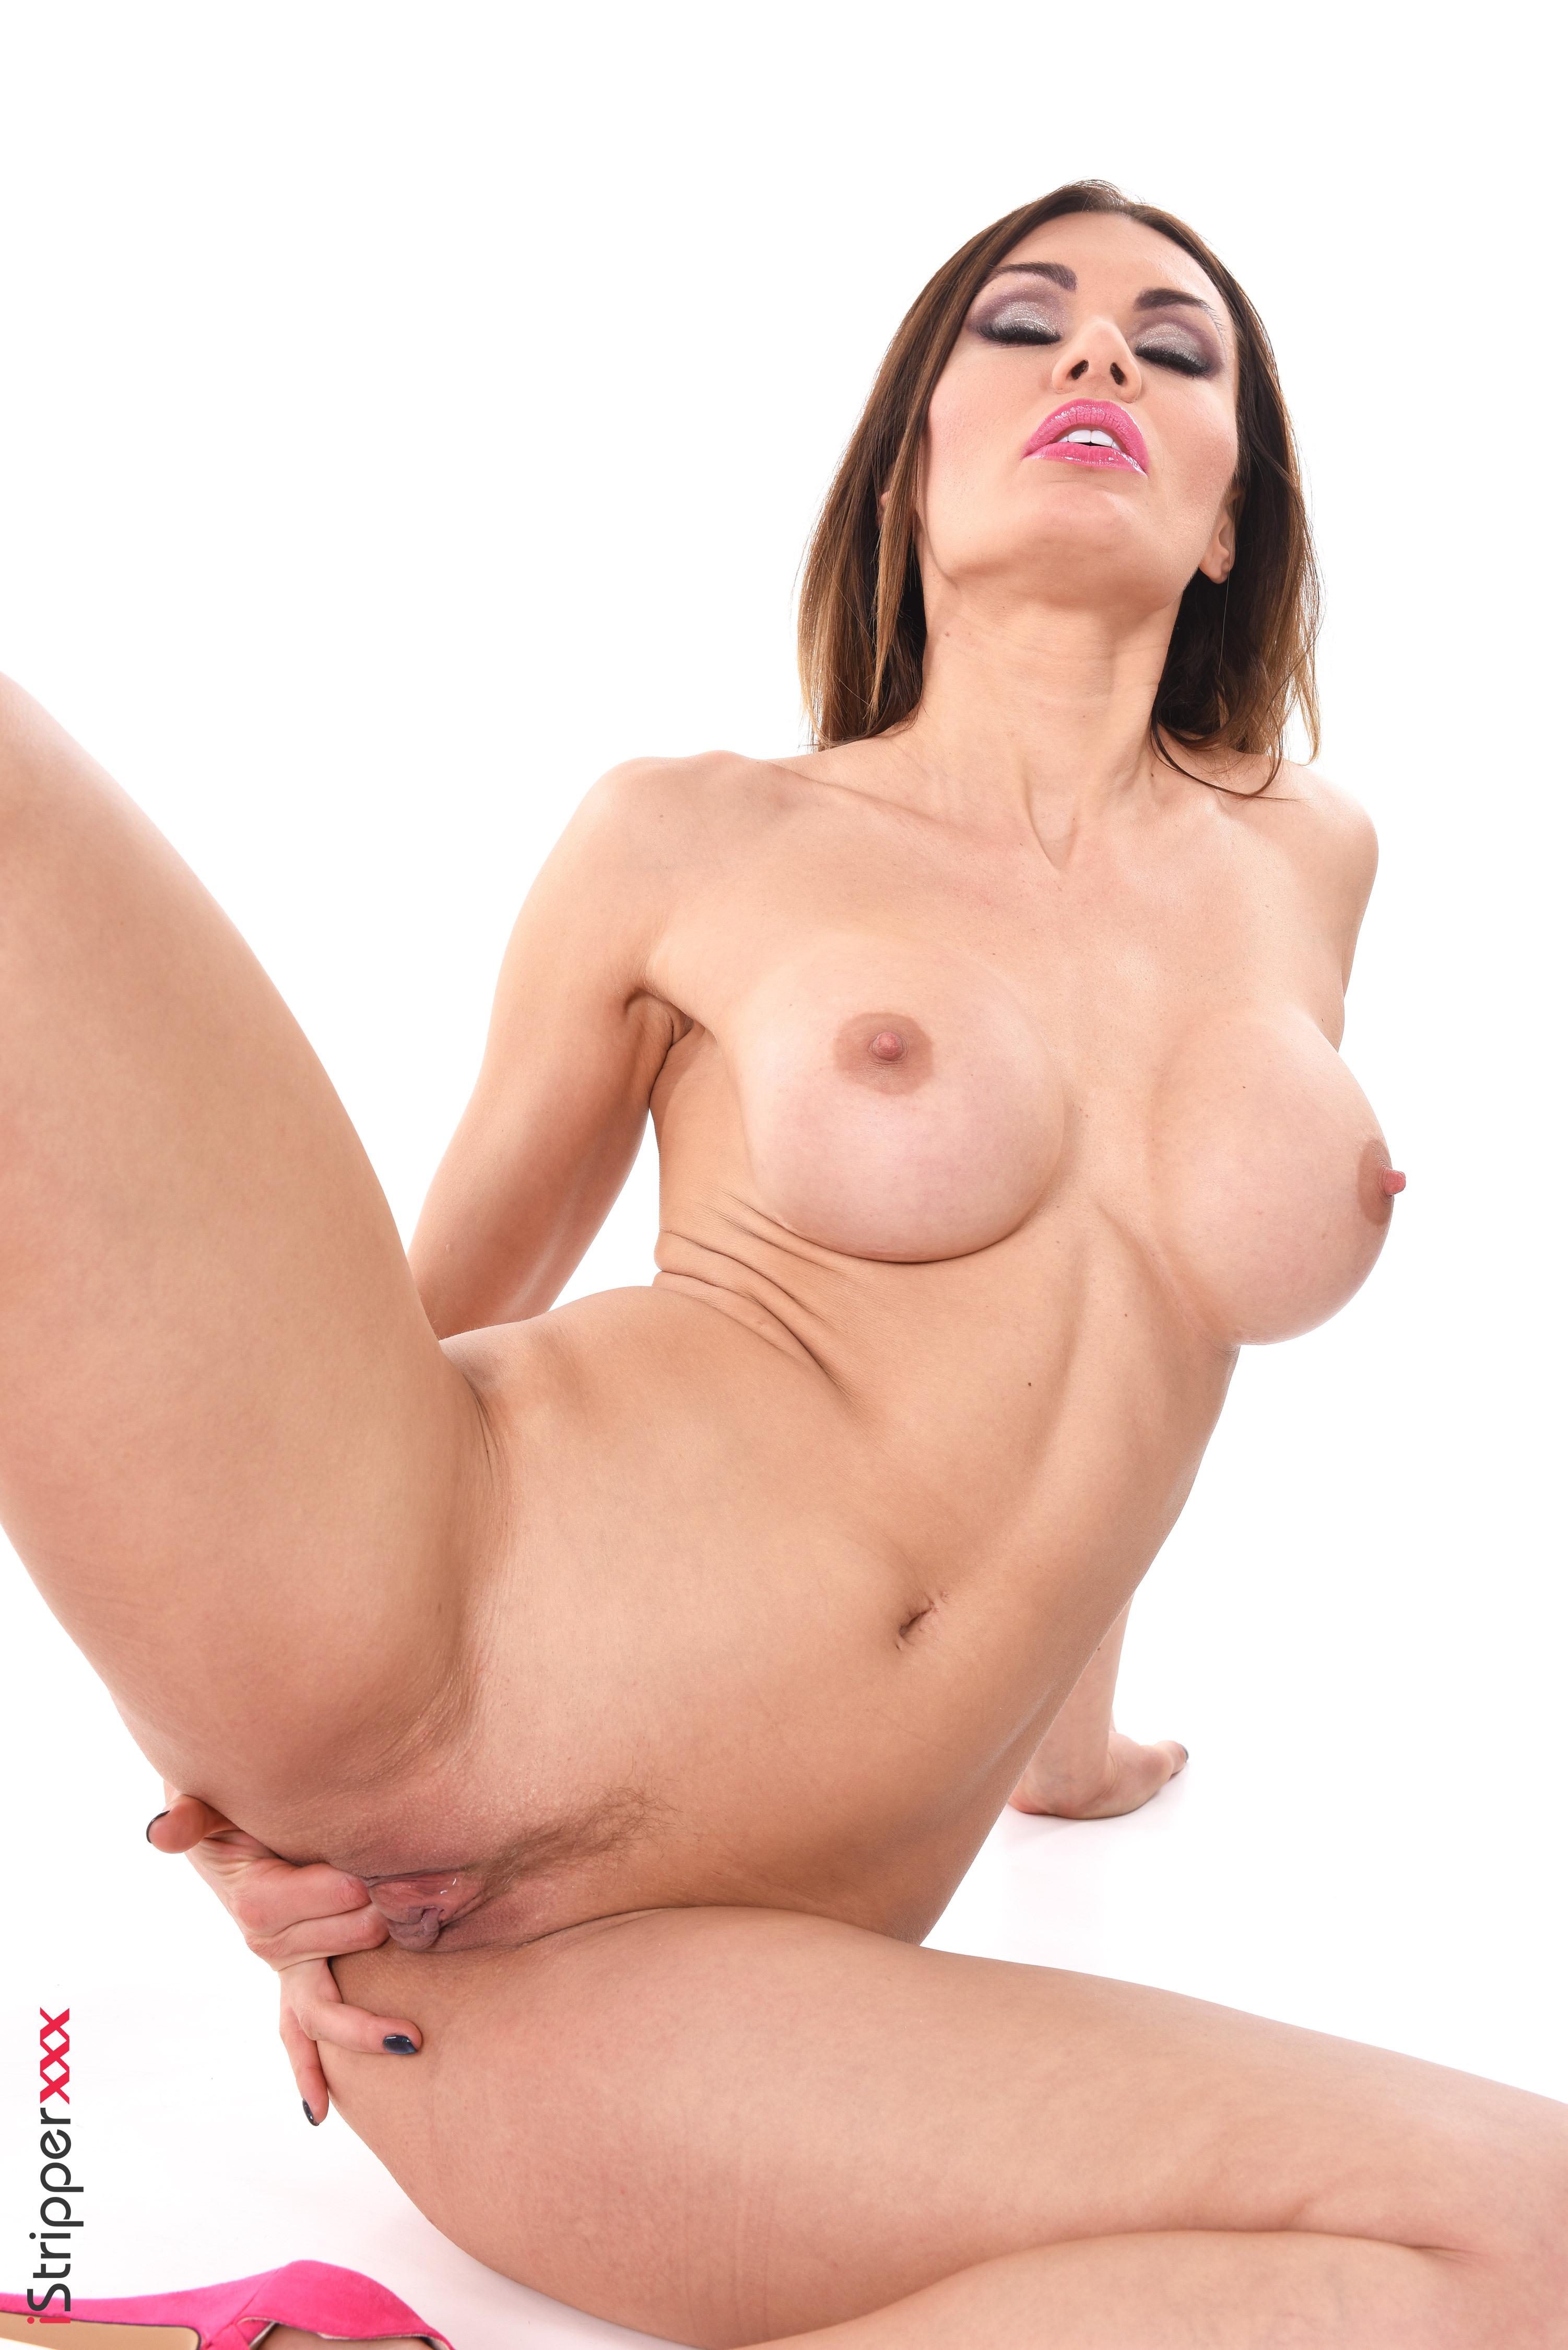 naked girl wallpaper download